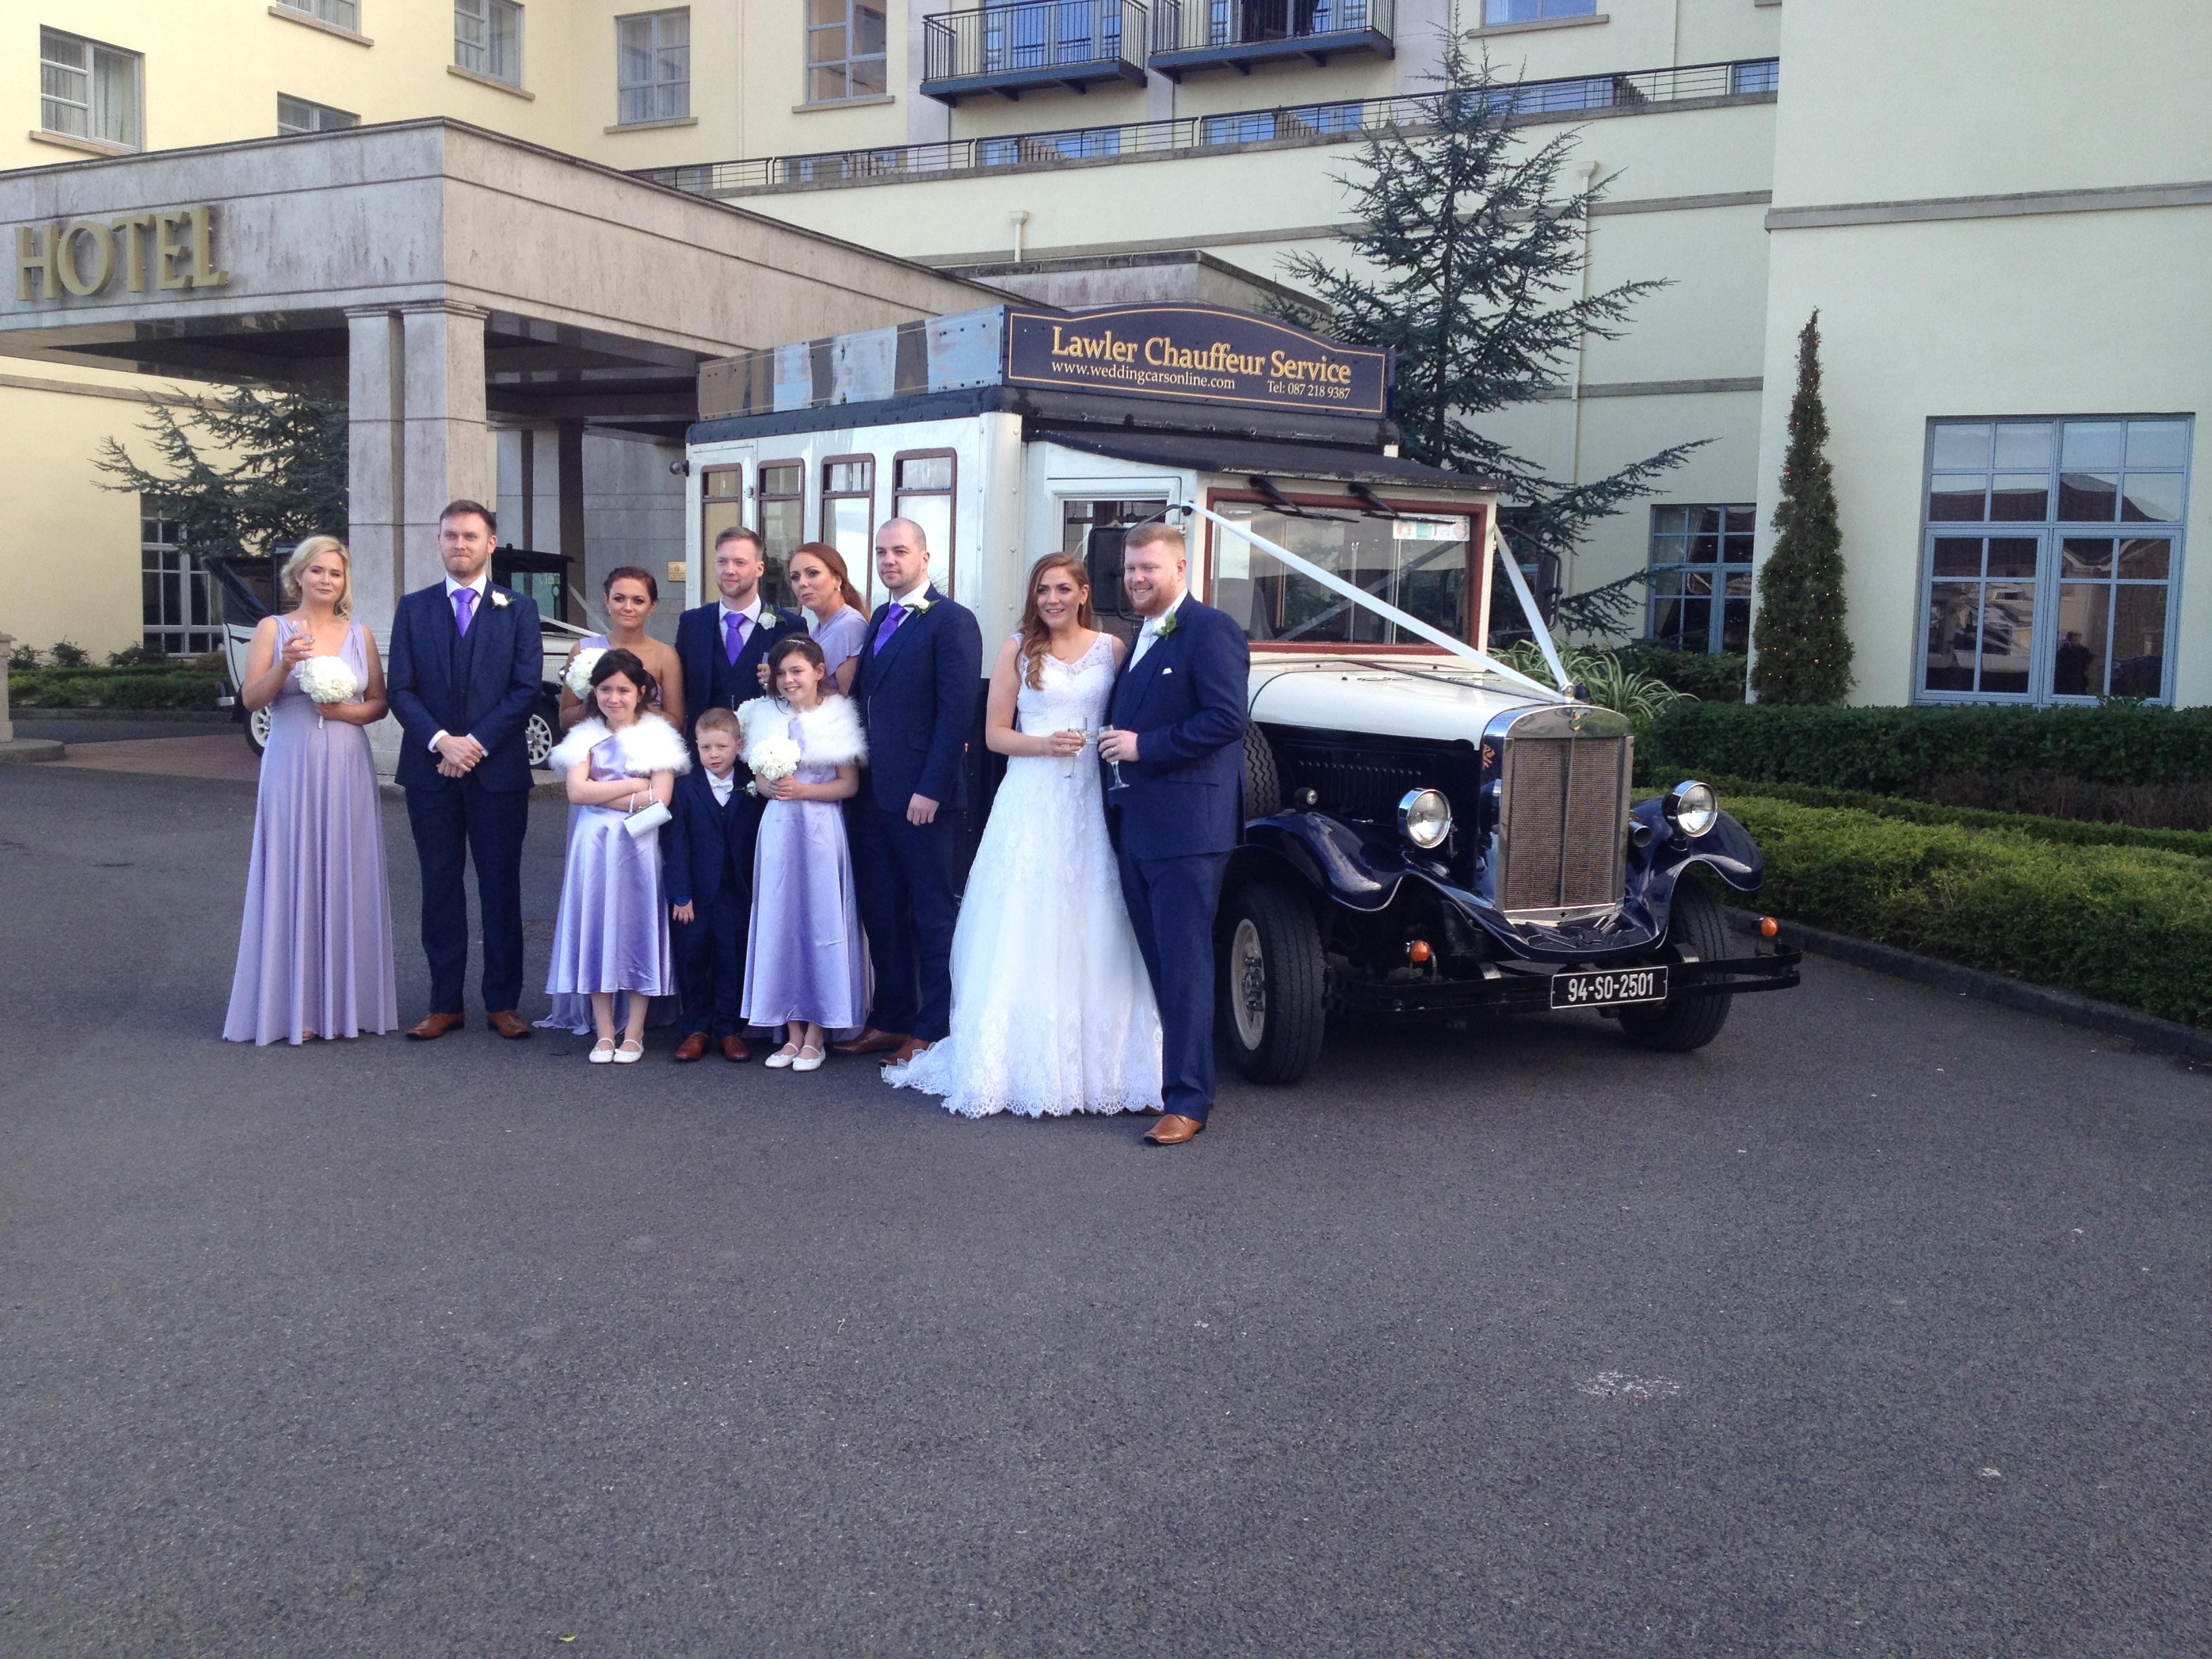 Asquith Palace (14 seater) Vintage Bus - Wedding Cars Dublin Ireland ...